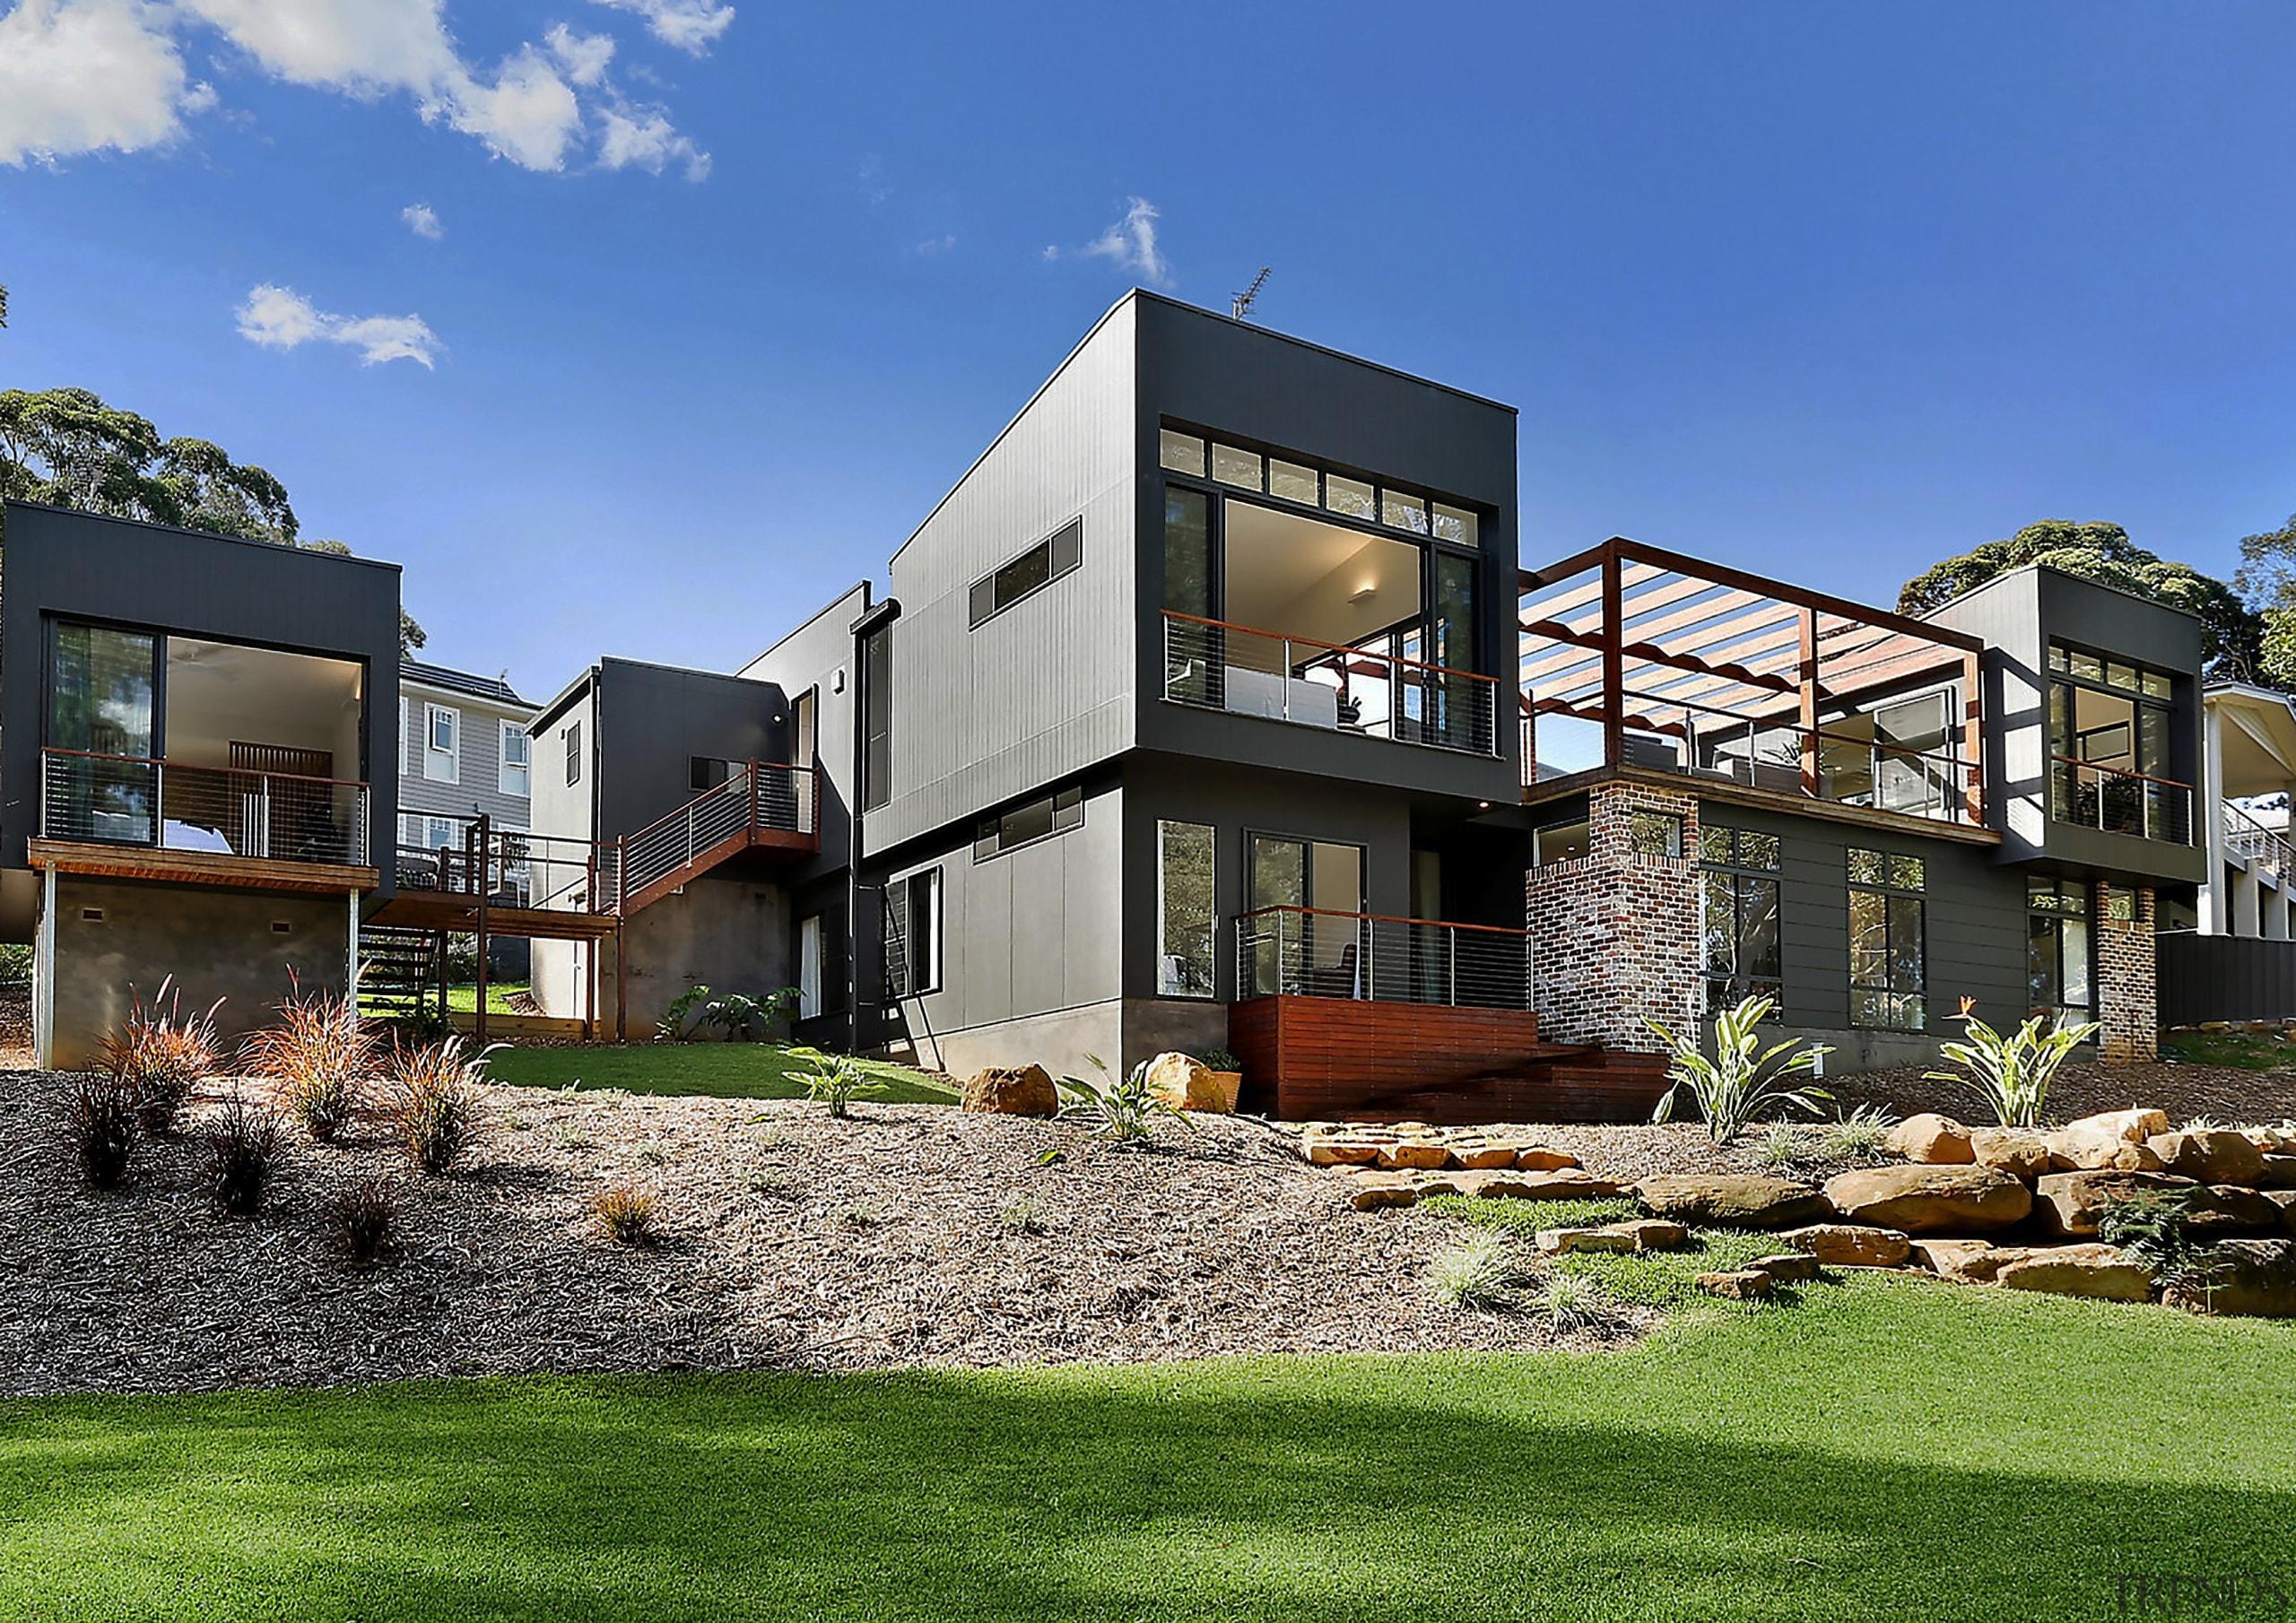 Alex Urena Design Studio - Highly Commended – architecture, backyard, cottage, elevation, estate, facade, home, house, neighbourhood, property, real estate, residential area, villa, yard, blue